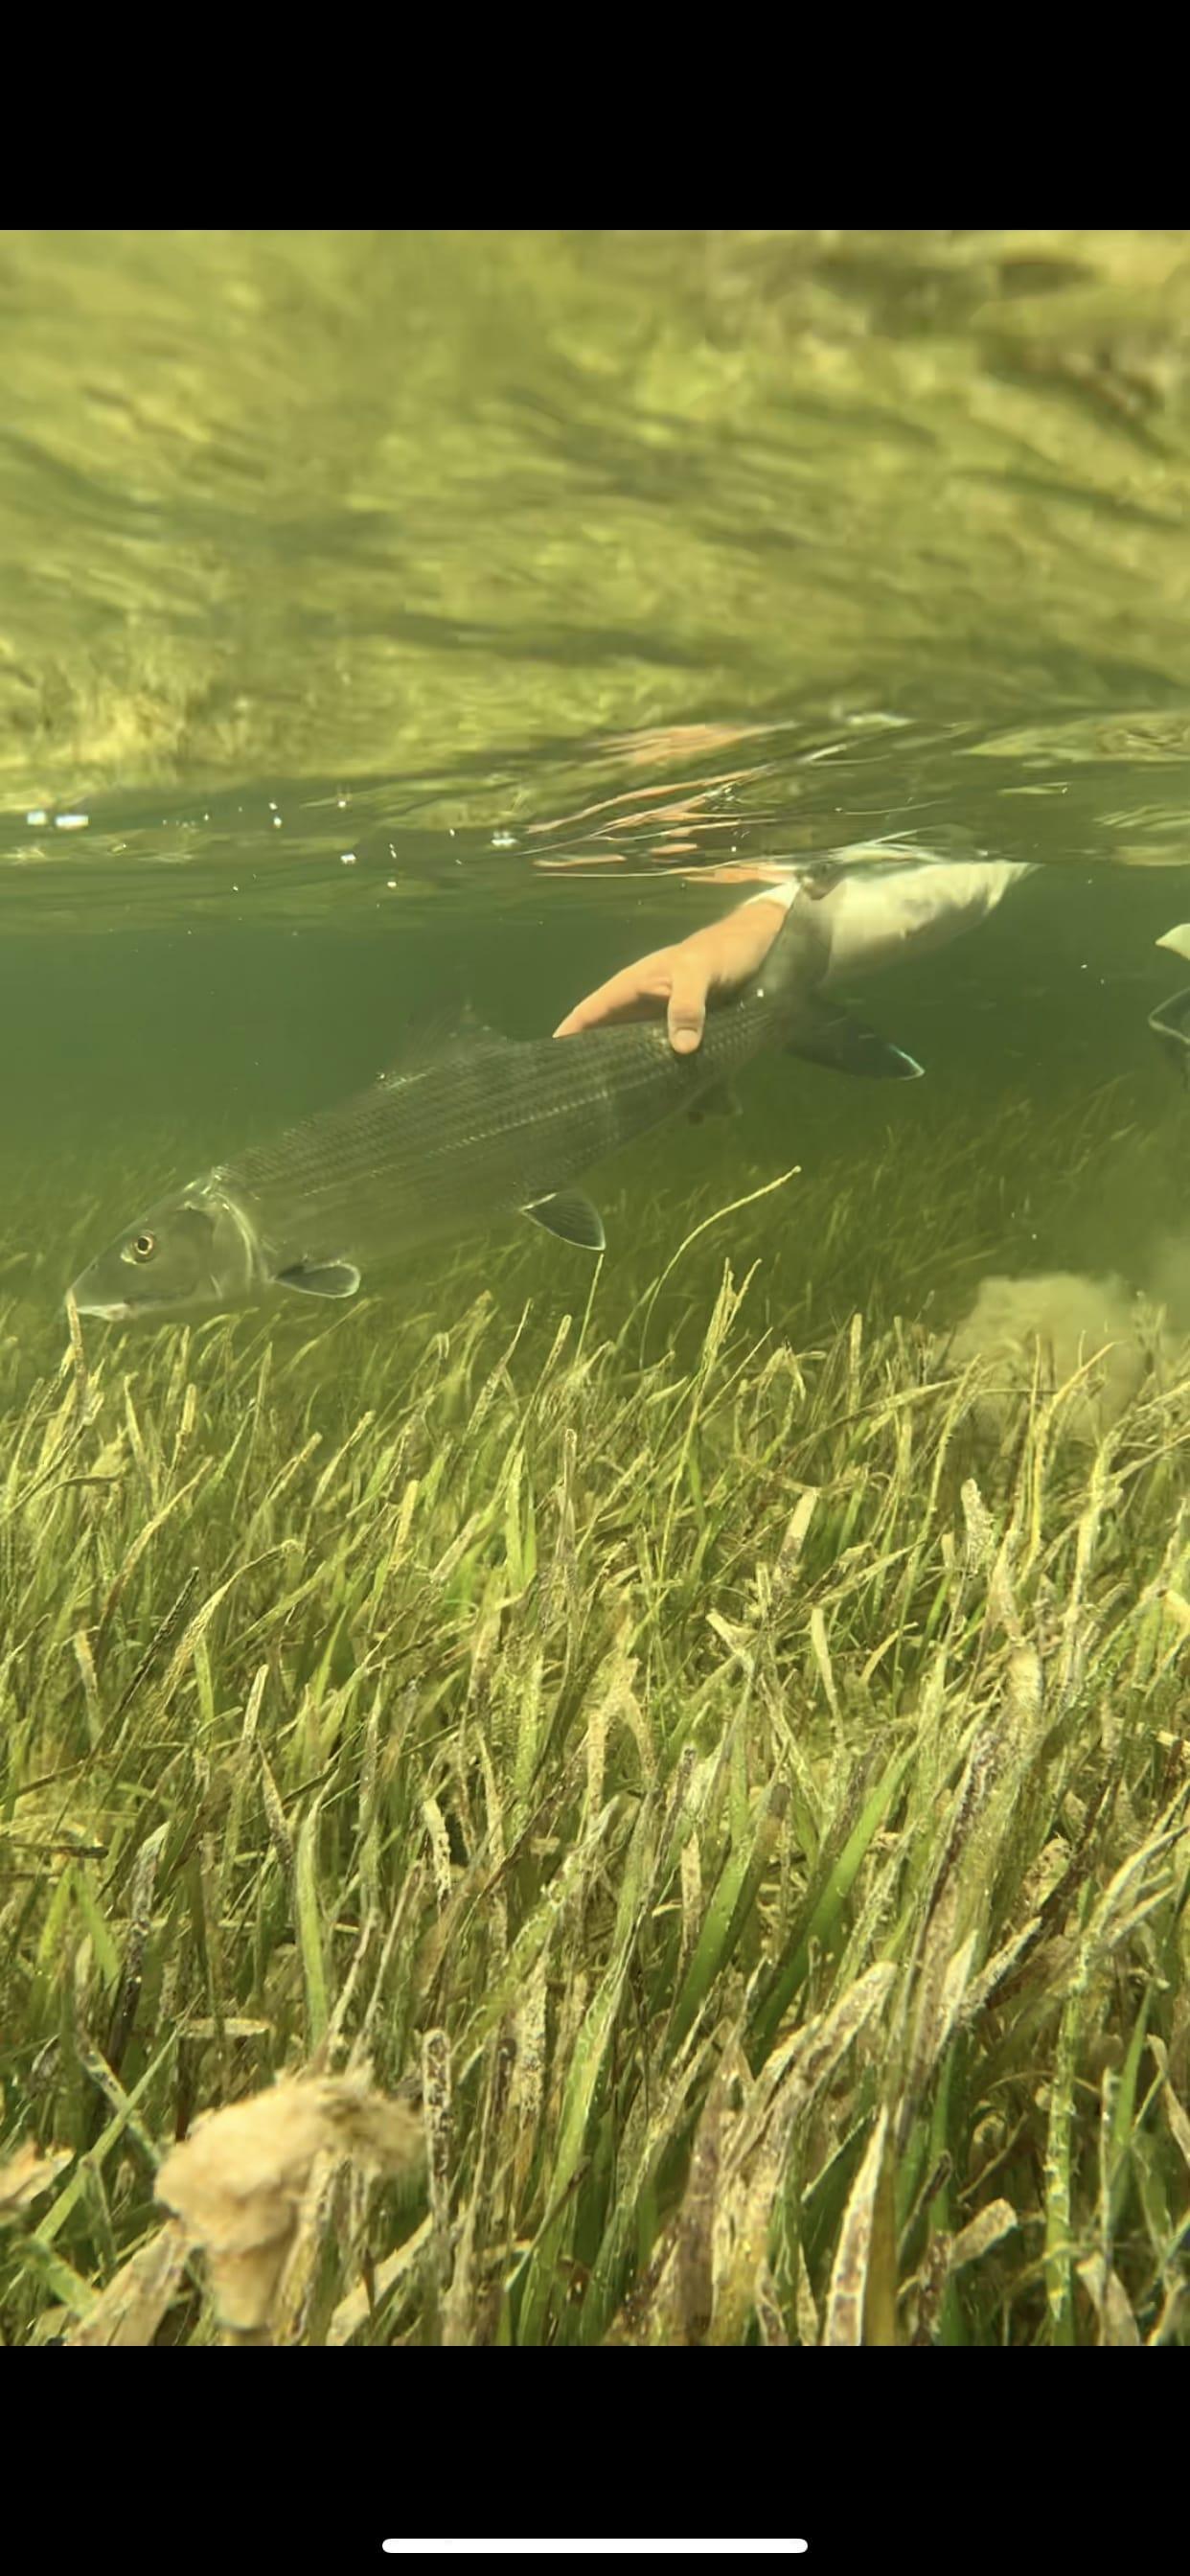 Bone fish release